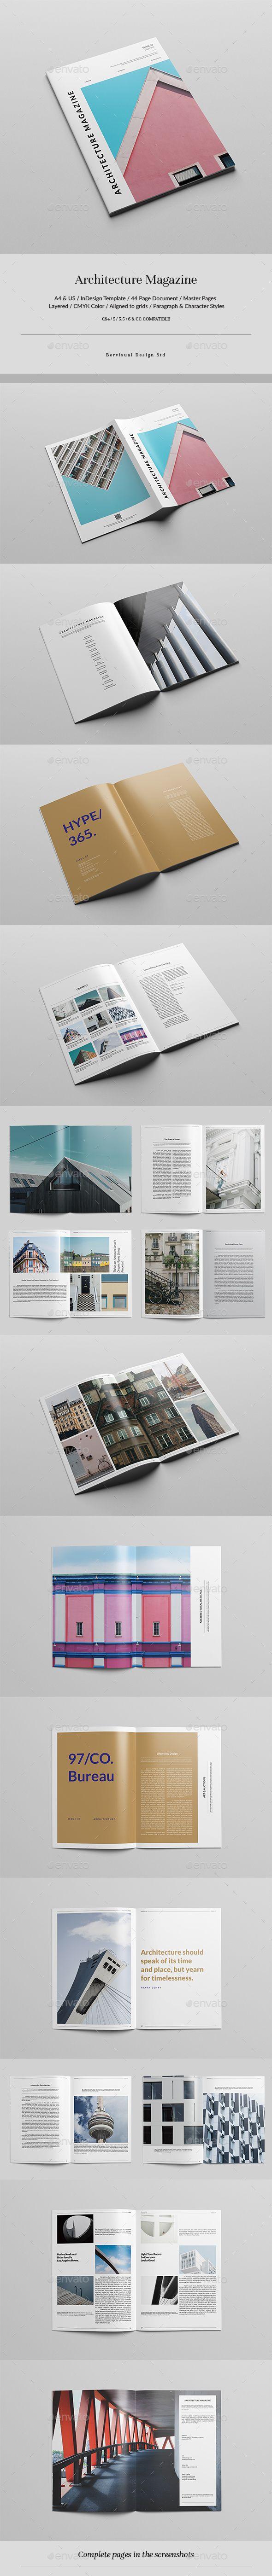 Architecture Magazine Design Template - Magazines Print Design Template InDesign INDD. Download here: https://graphicriver.net/item/architecture-magazine/19384820?ref=yinkira